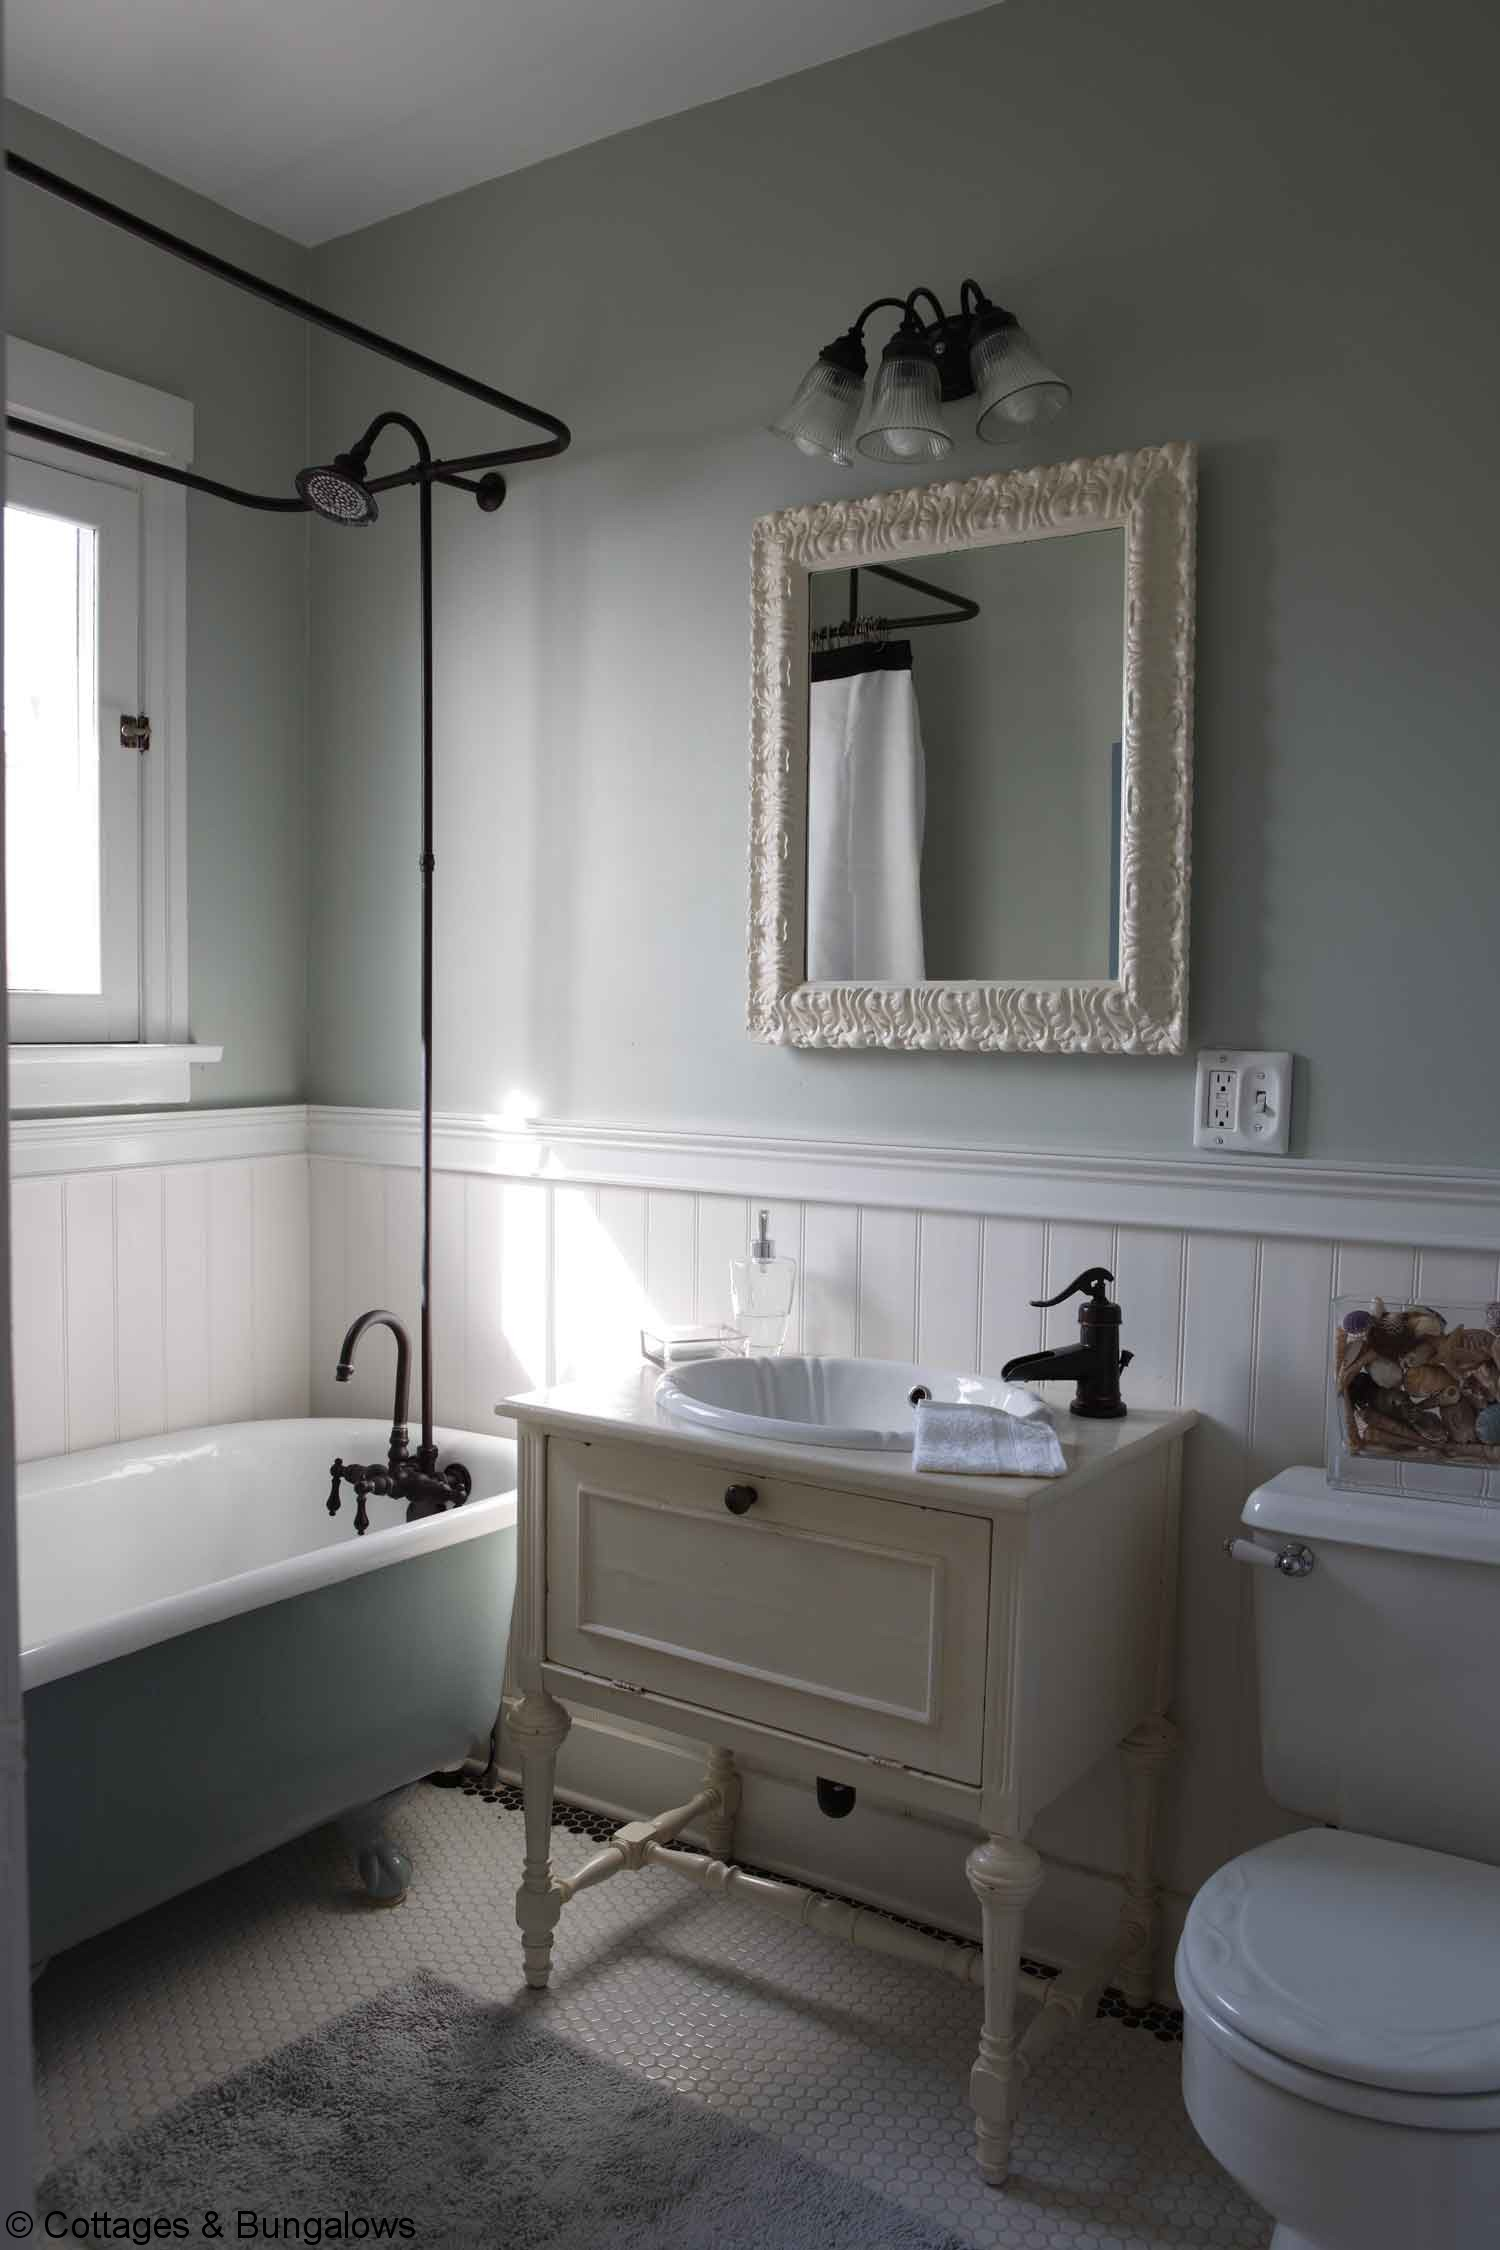 Vintage style bathroom sinks - Bathroom And Installed Vintage Style Hexagonal Tiles